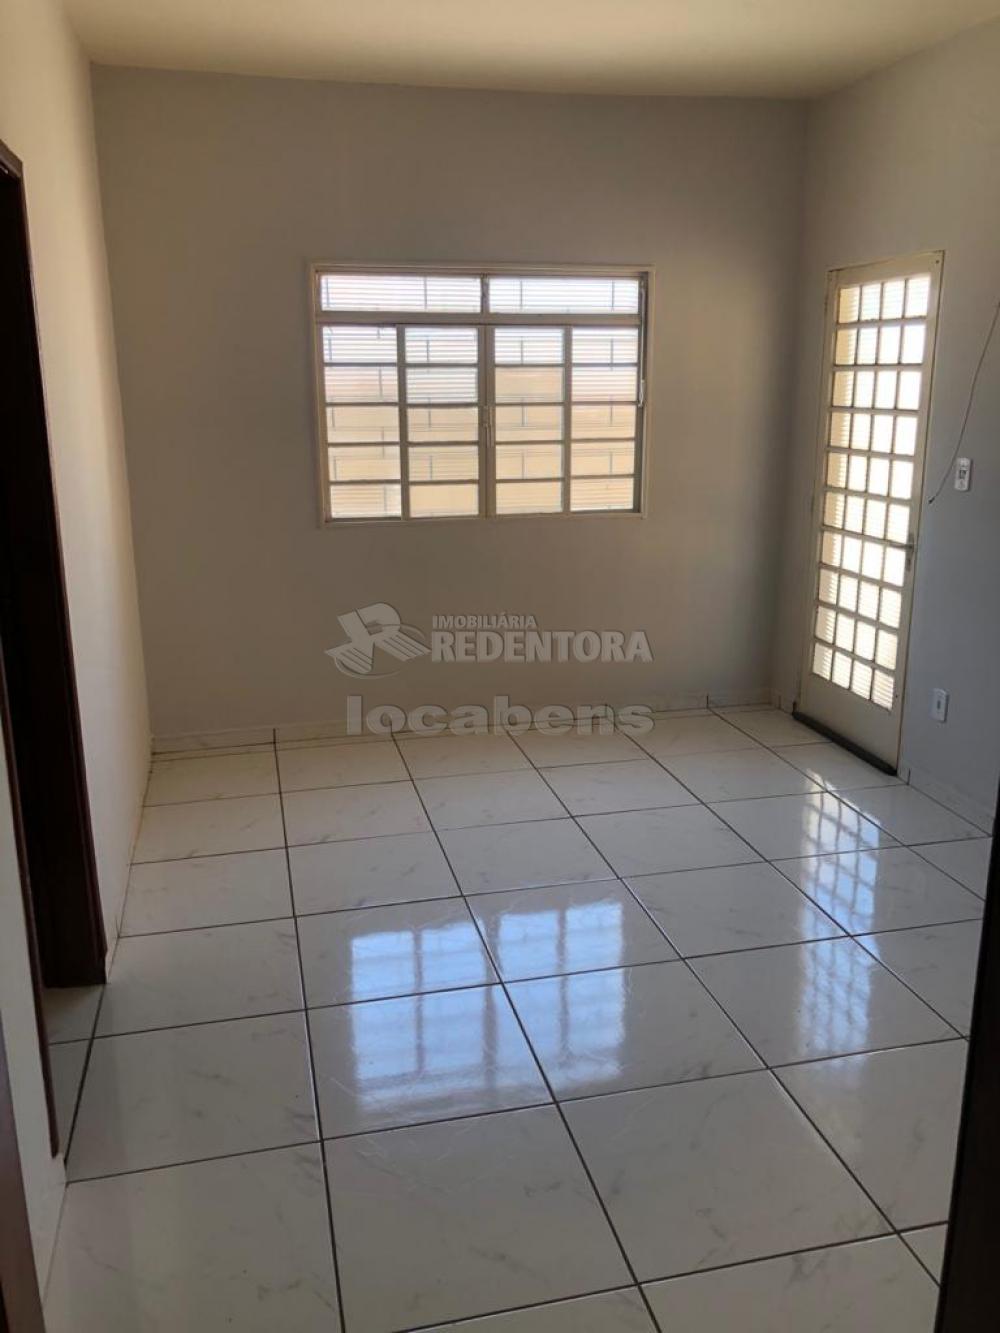 Sao Jose do Rio Preto Casa Locacao R$ 950,00 3 Dormitorios 3 Vagas Area do terreno 300.00m2 Area construida 90.00m2